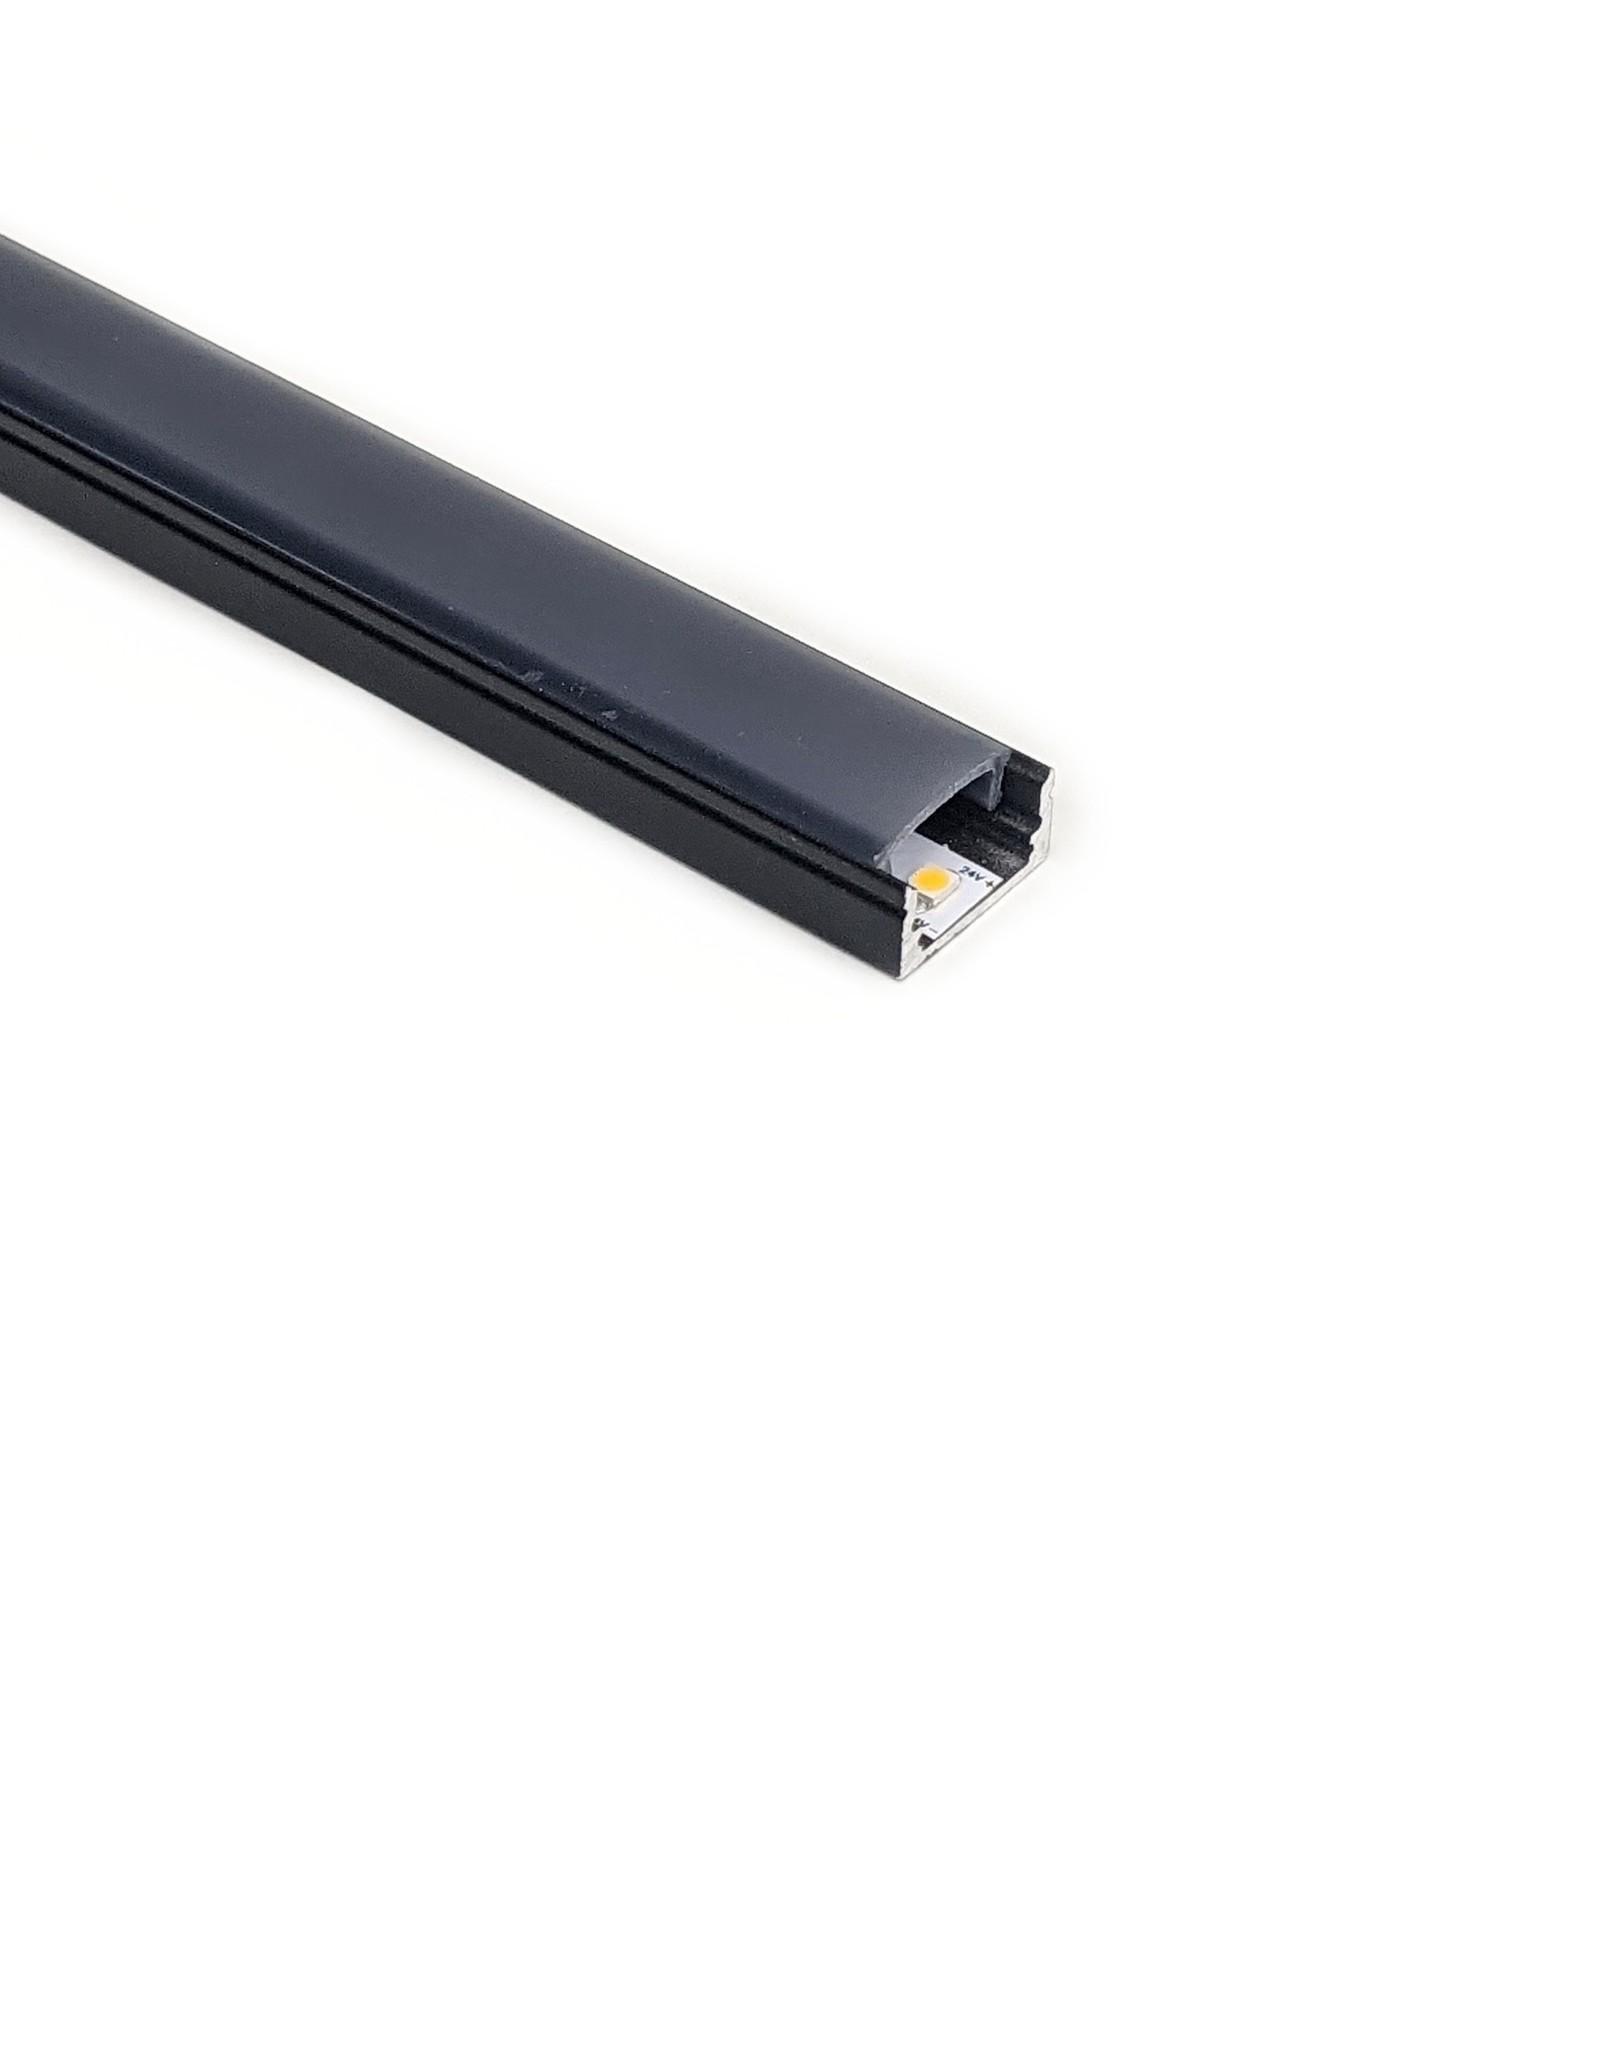 LedLed Aluminium in- en opbouw profiel zwart 7mm - PRO